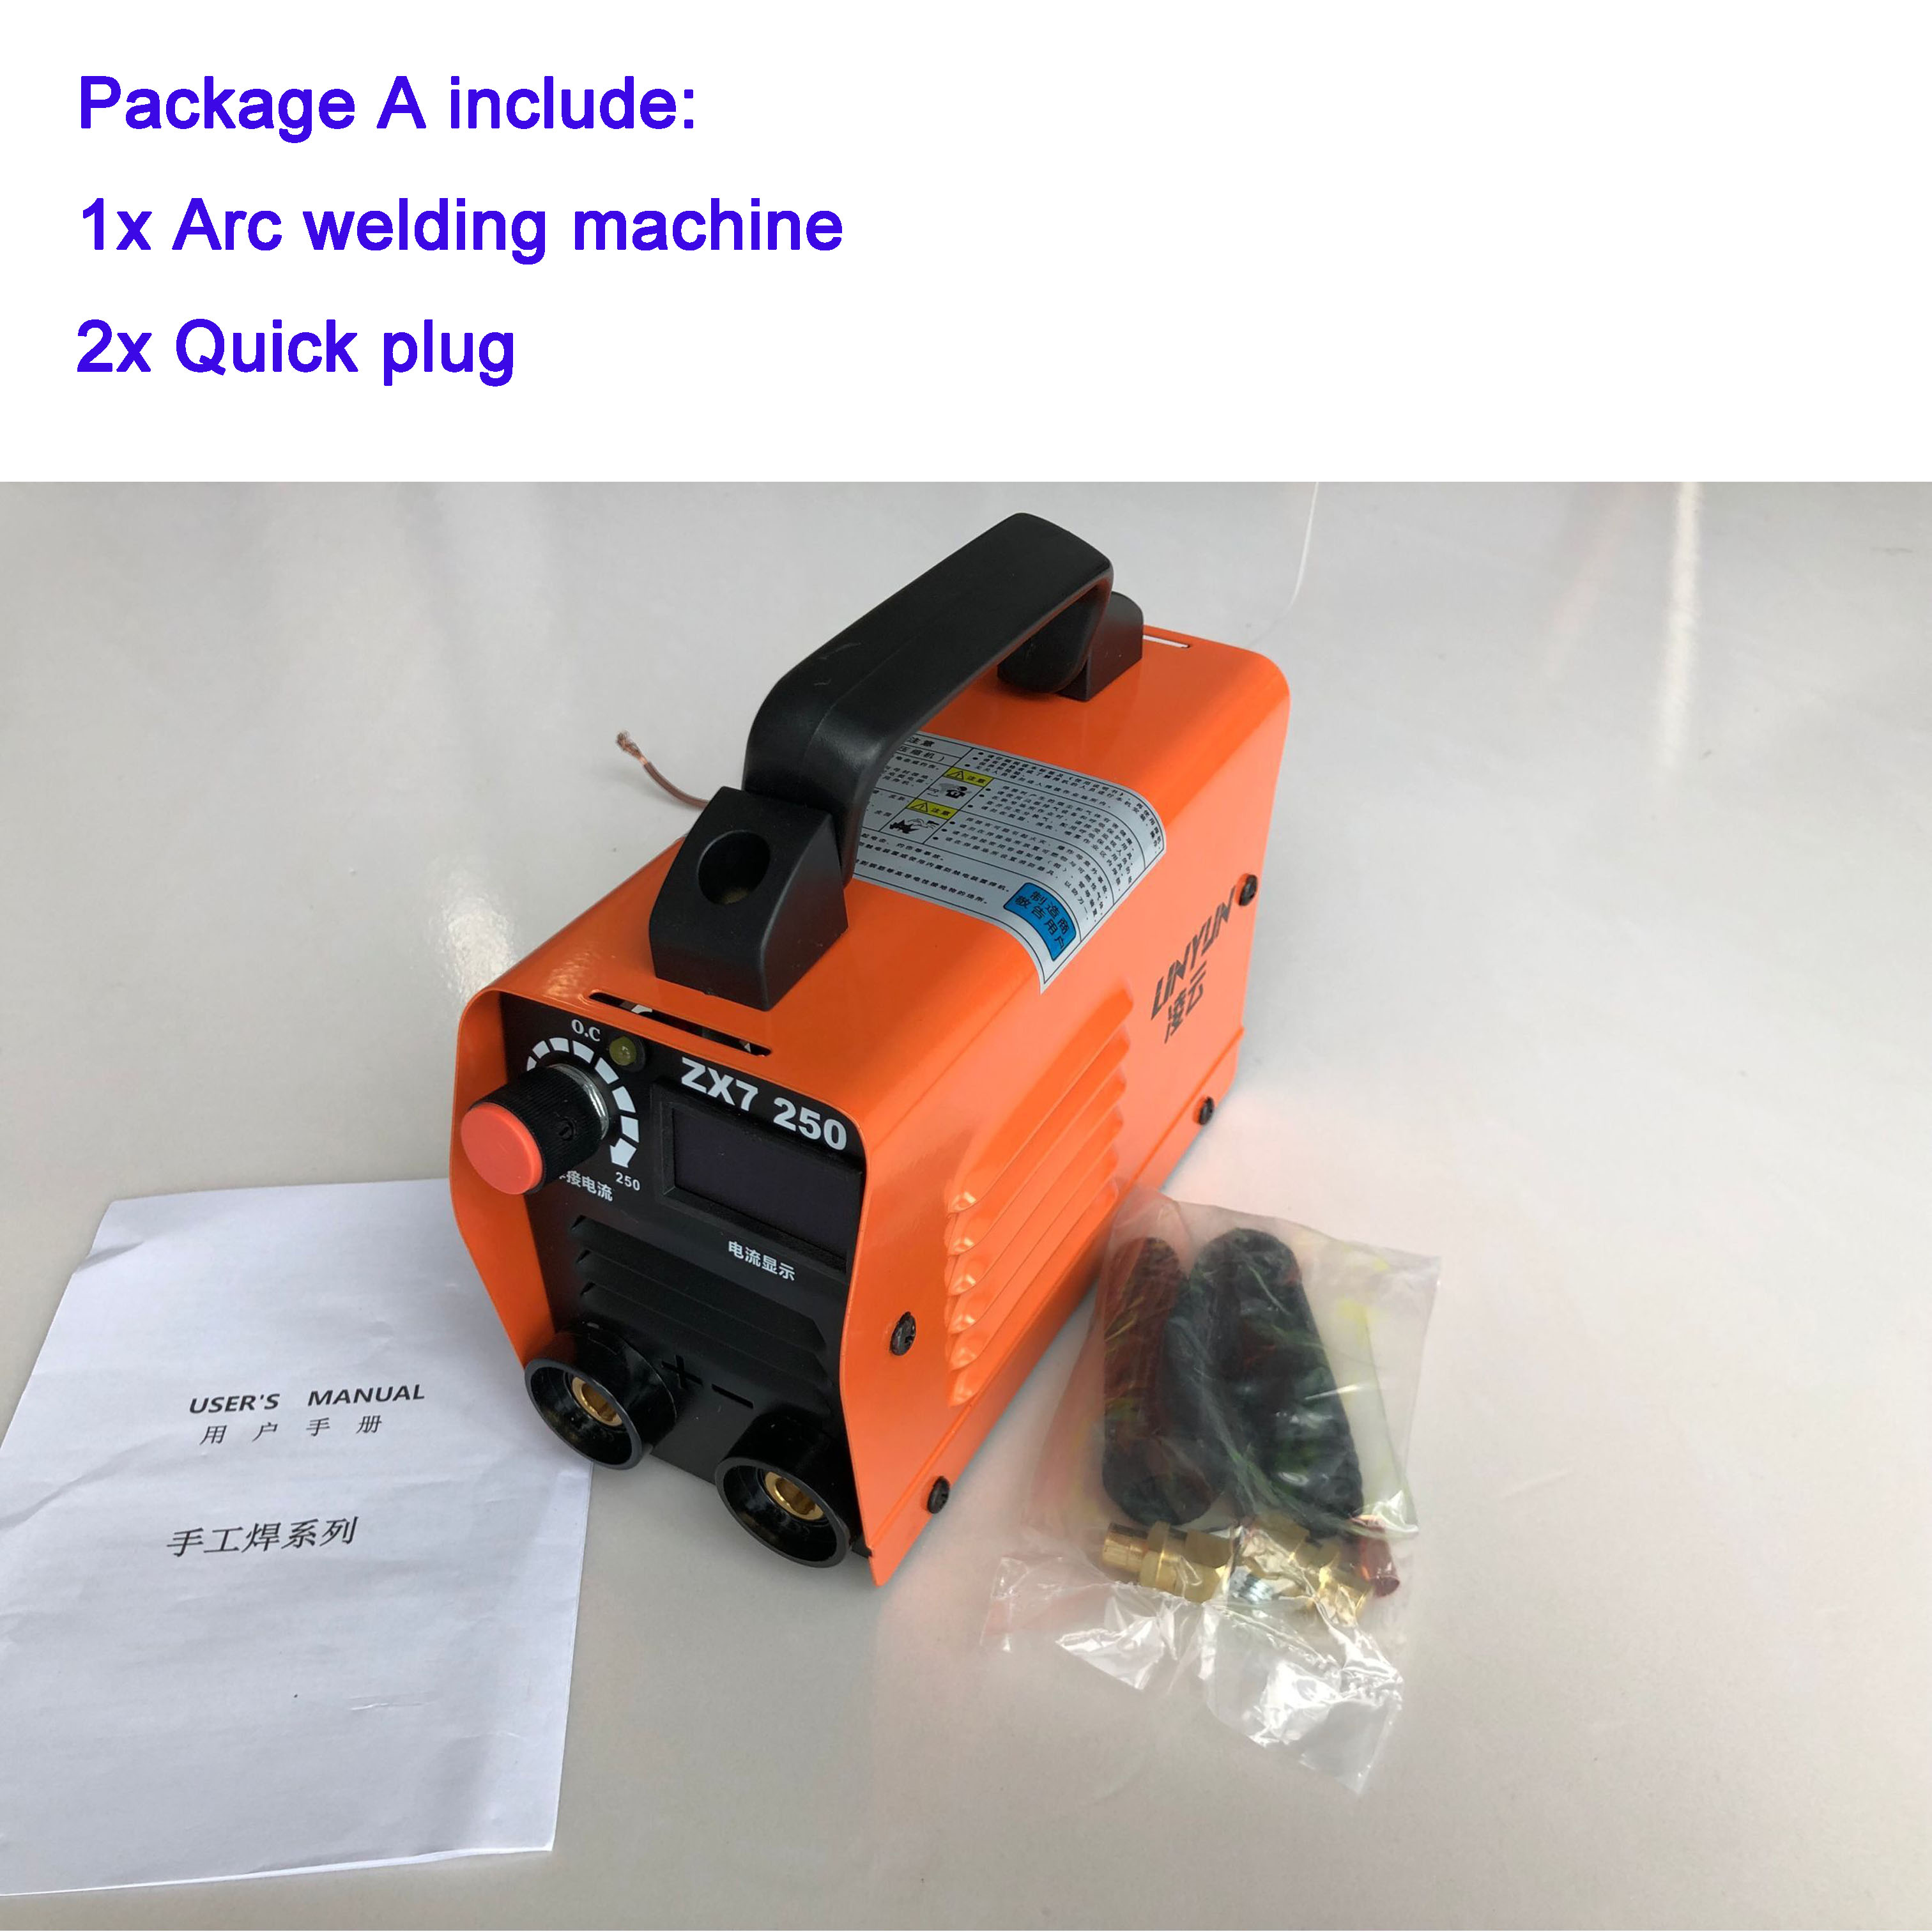 Zx7 250 Mini Welding Machine Welding Inverter 220V Inverter Welder